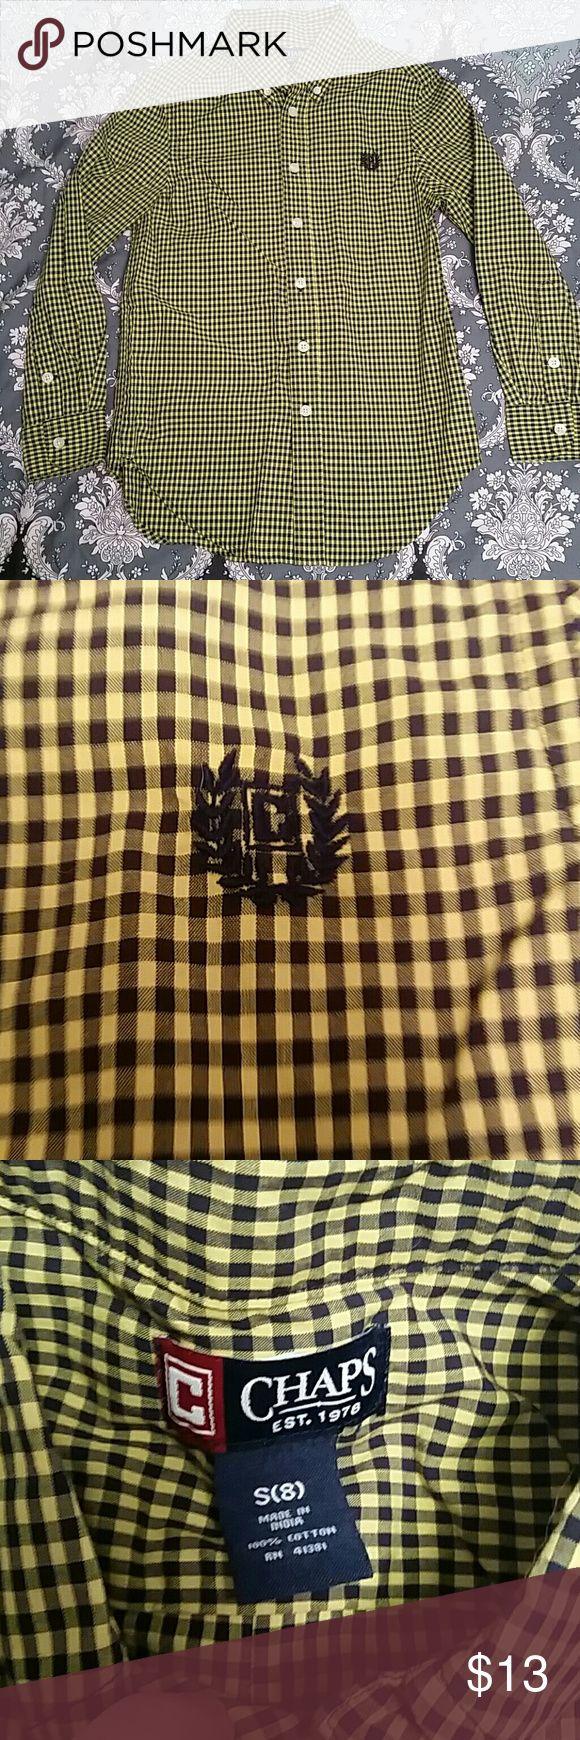 Chaps Ralph Lauren Black & Yellow Button Down Boys Chaps Ralph Lauren Black & Yellow micro-plaid Button Down shirt. Bright Gold and Black pattern. NWOT Chaps Shirts & Tops Button Down Shirts